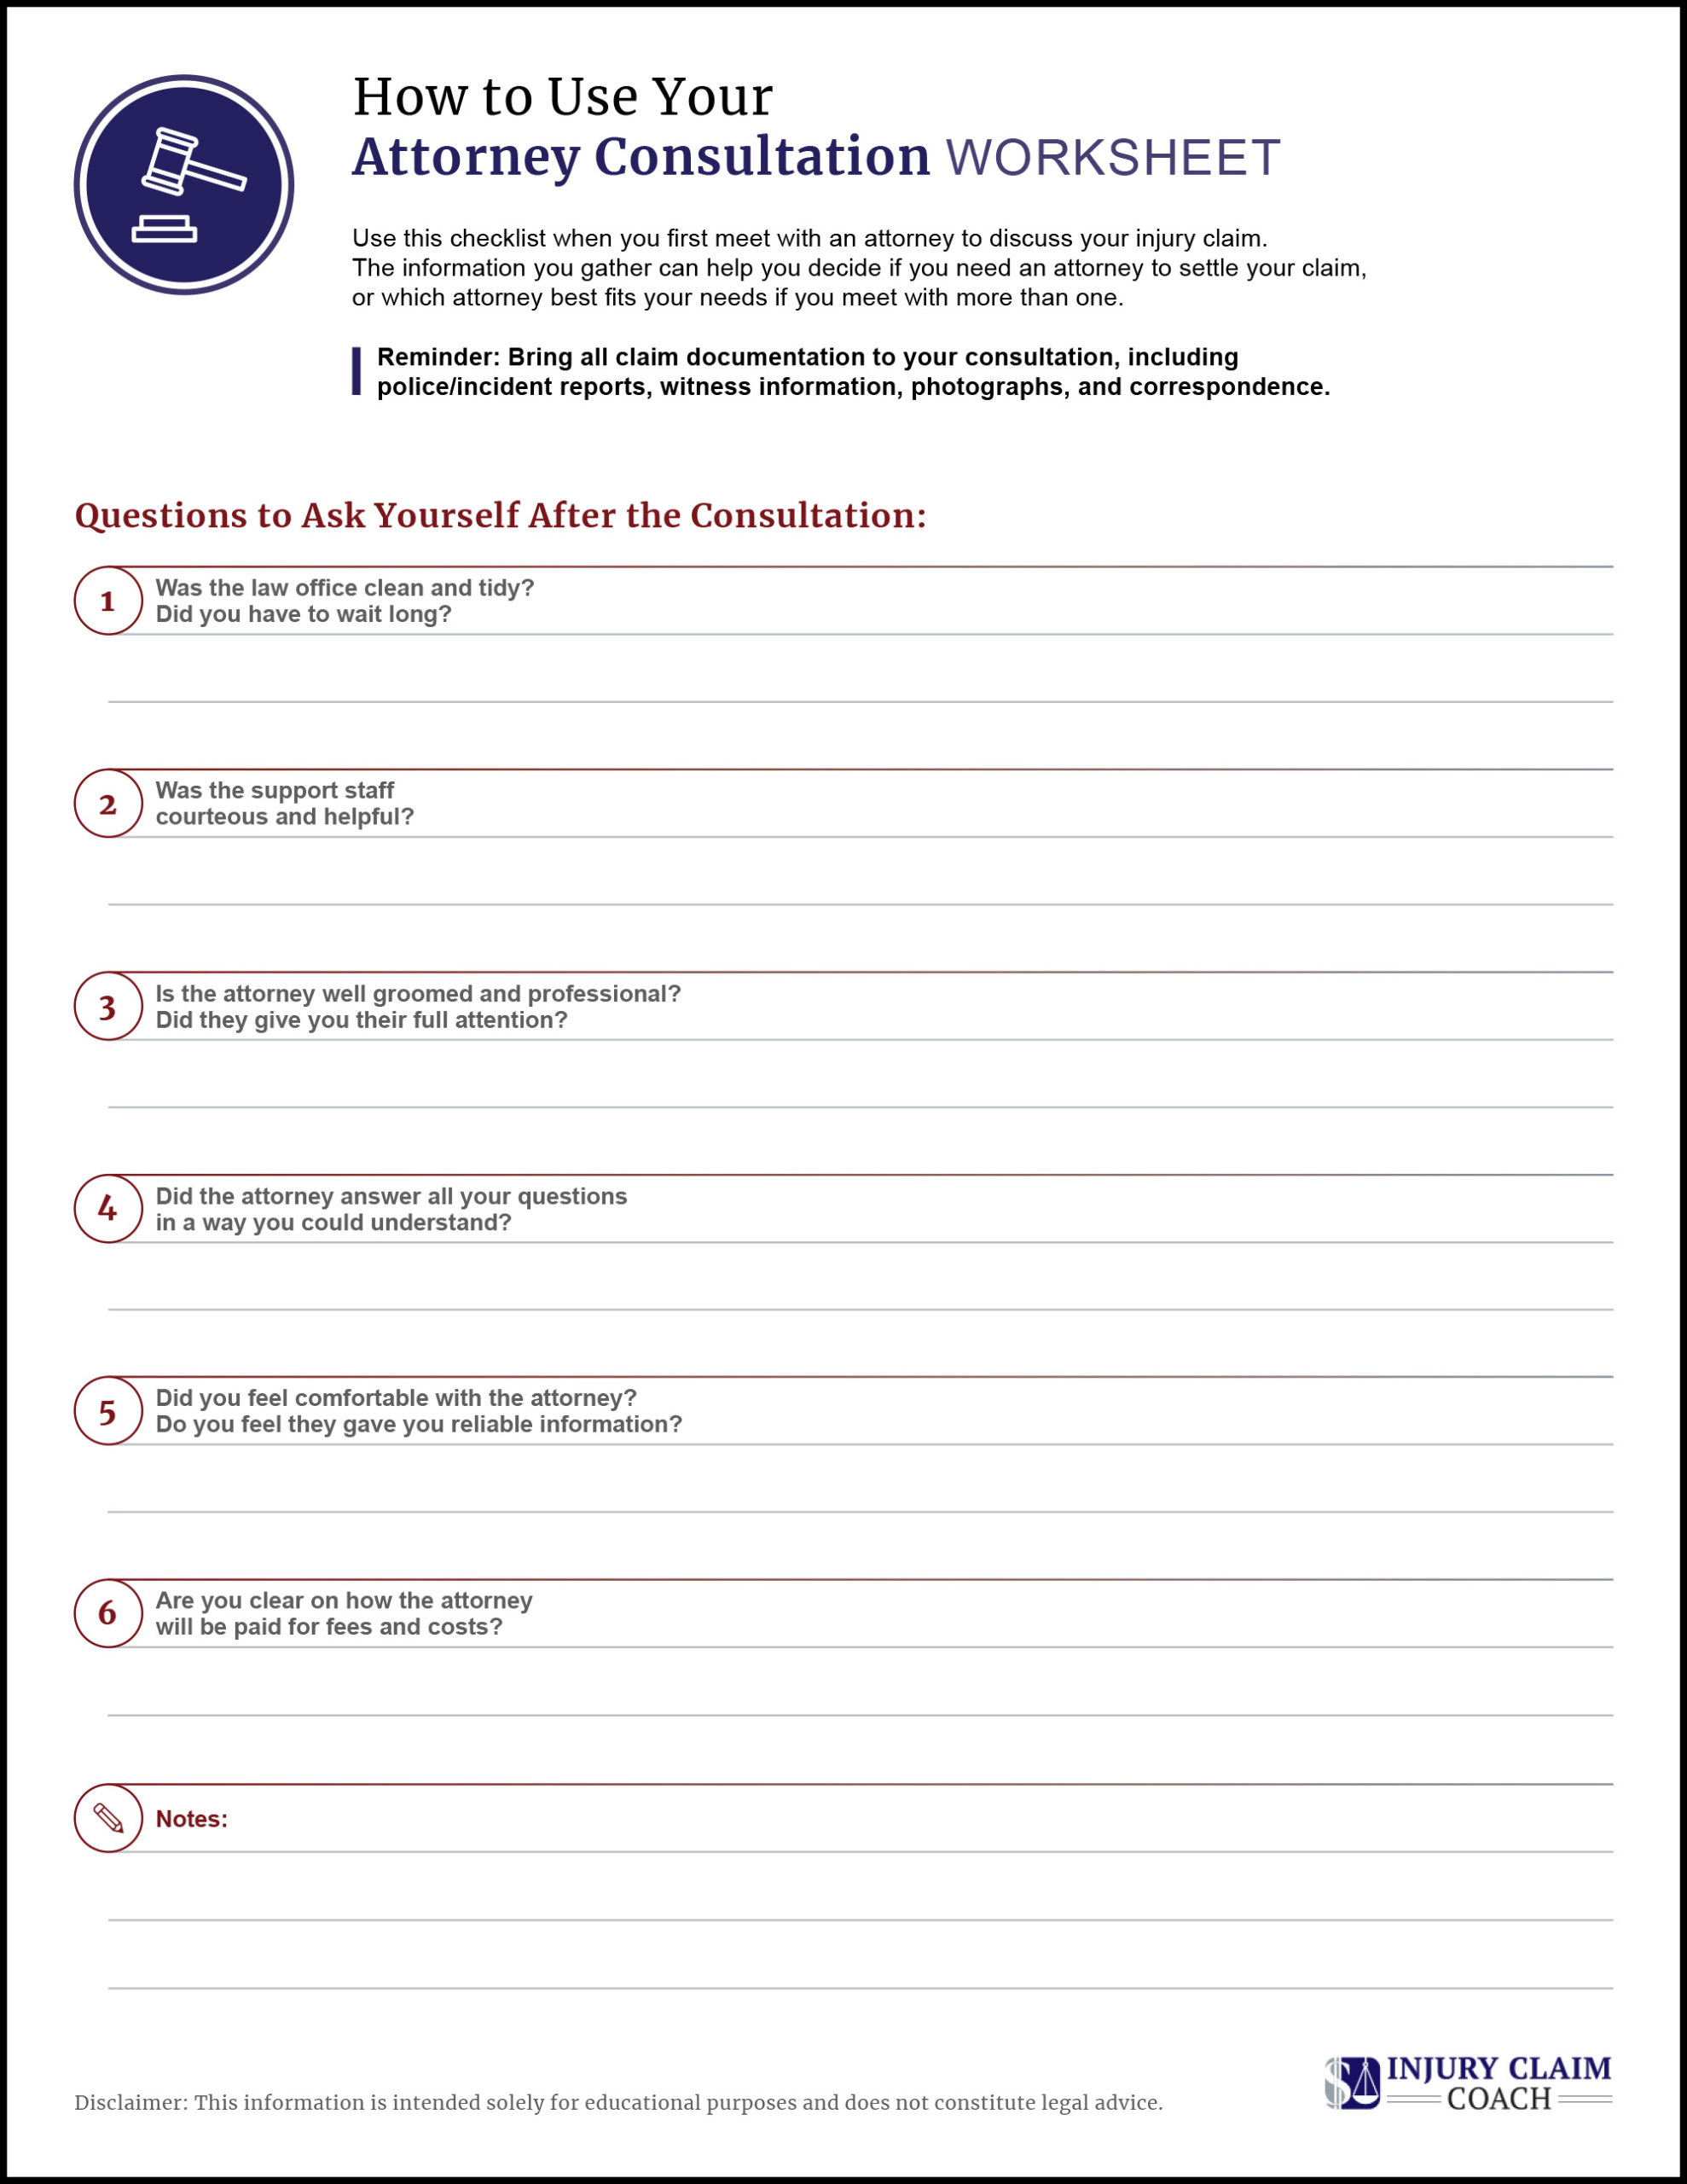 Choosing Attorney Checklist page 2